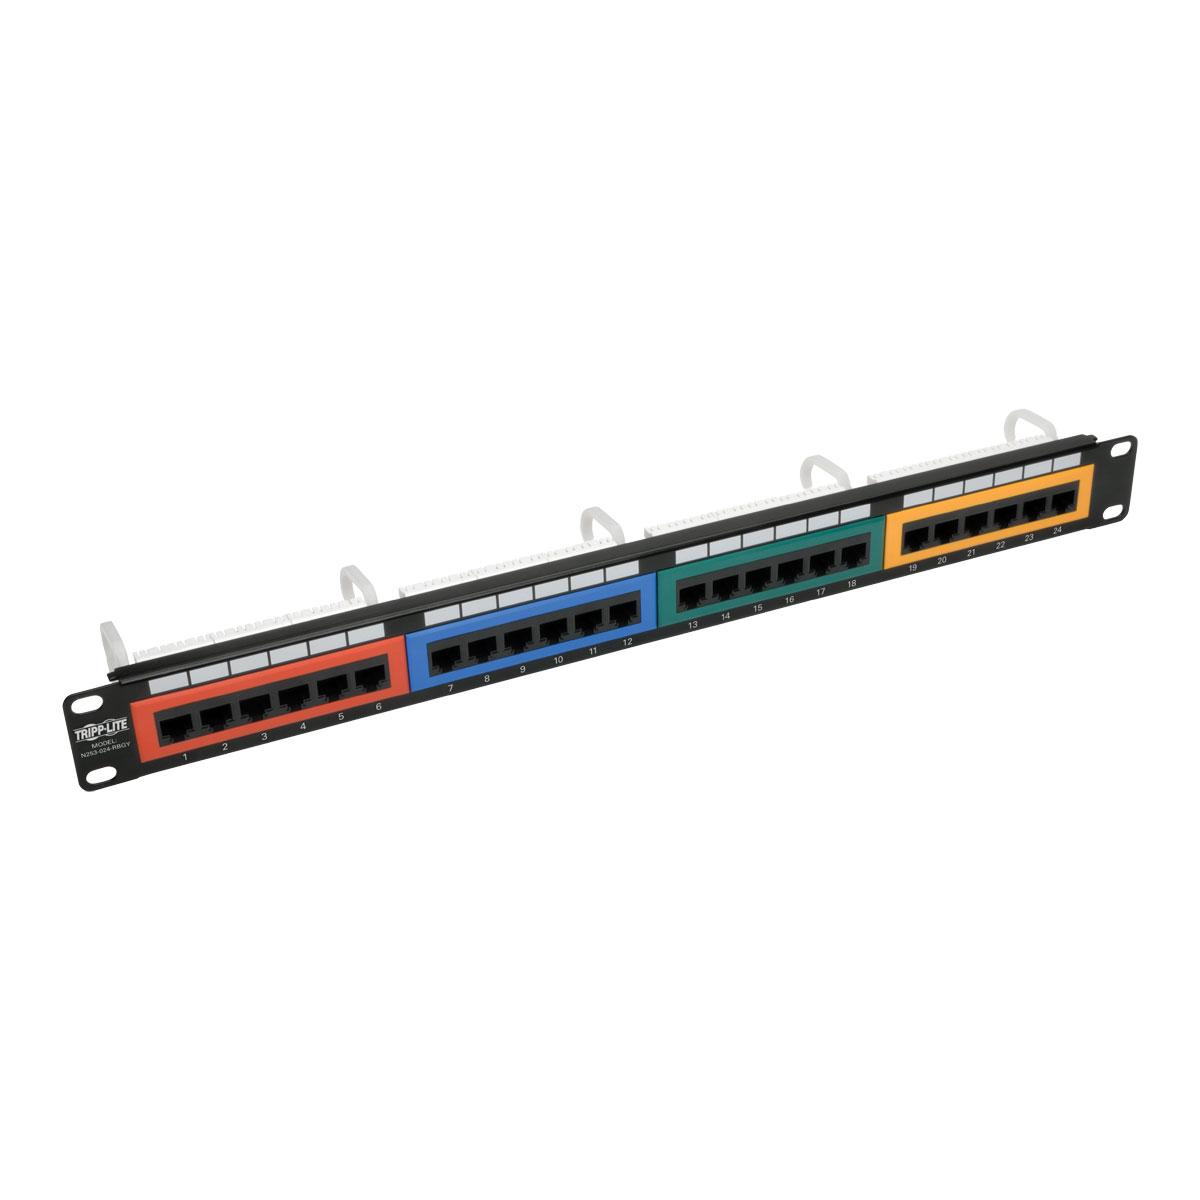 568b Rj45 Color Wiring Diagram